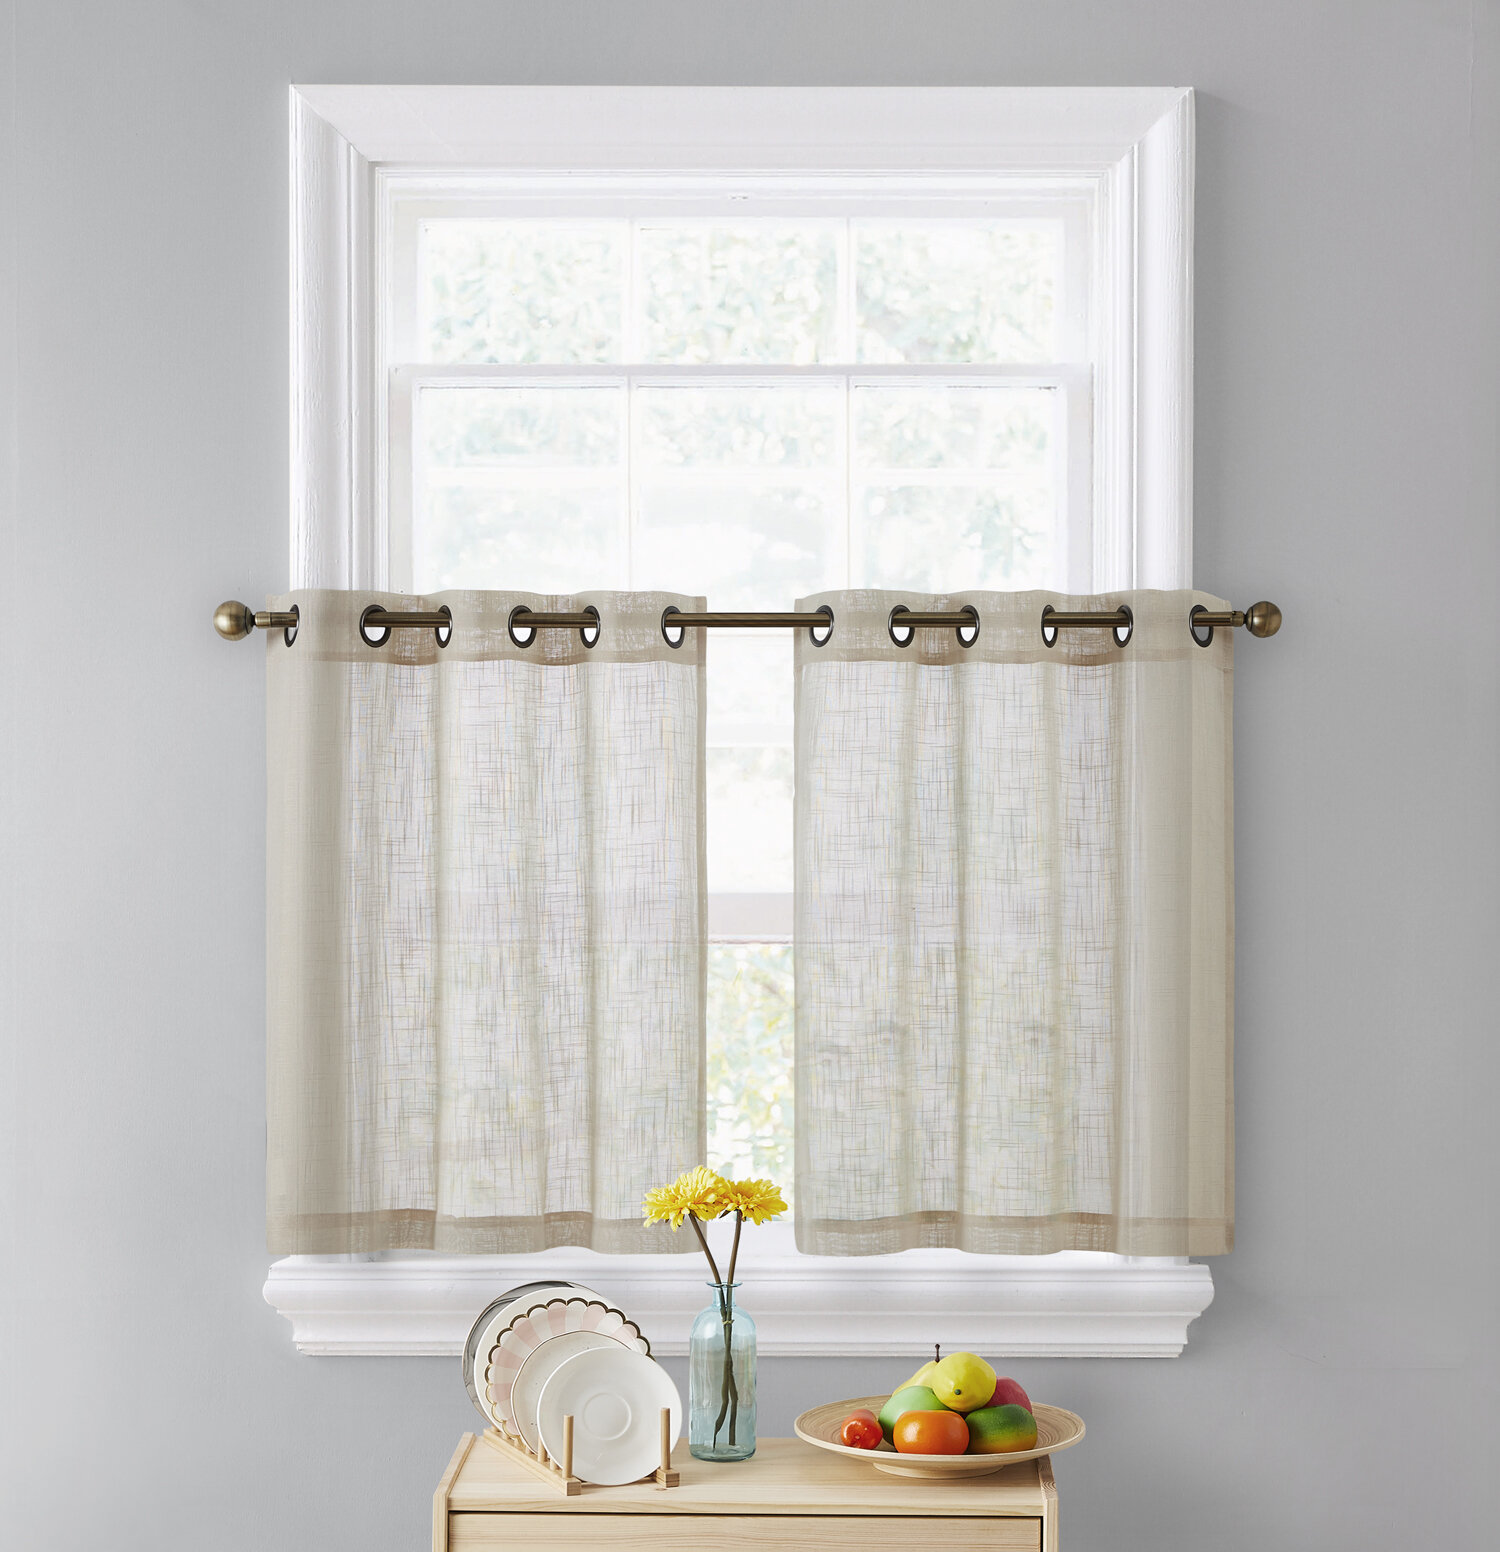 Wayfair Linen Valances Kitchen Curtains You Ll Love In 2021